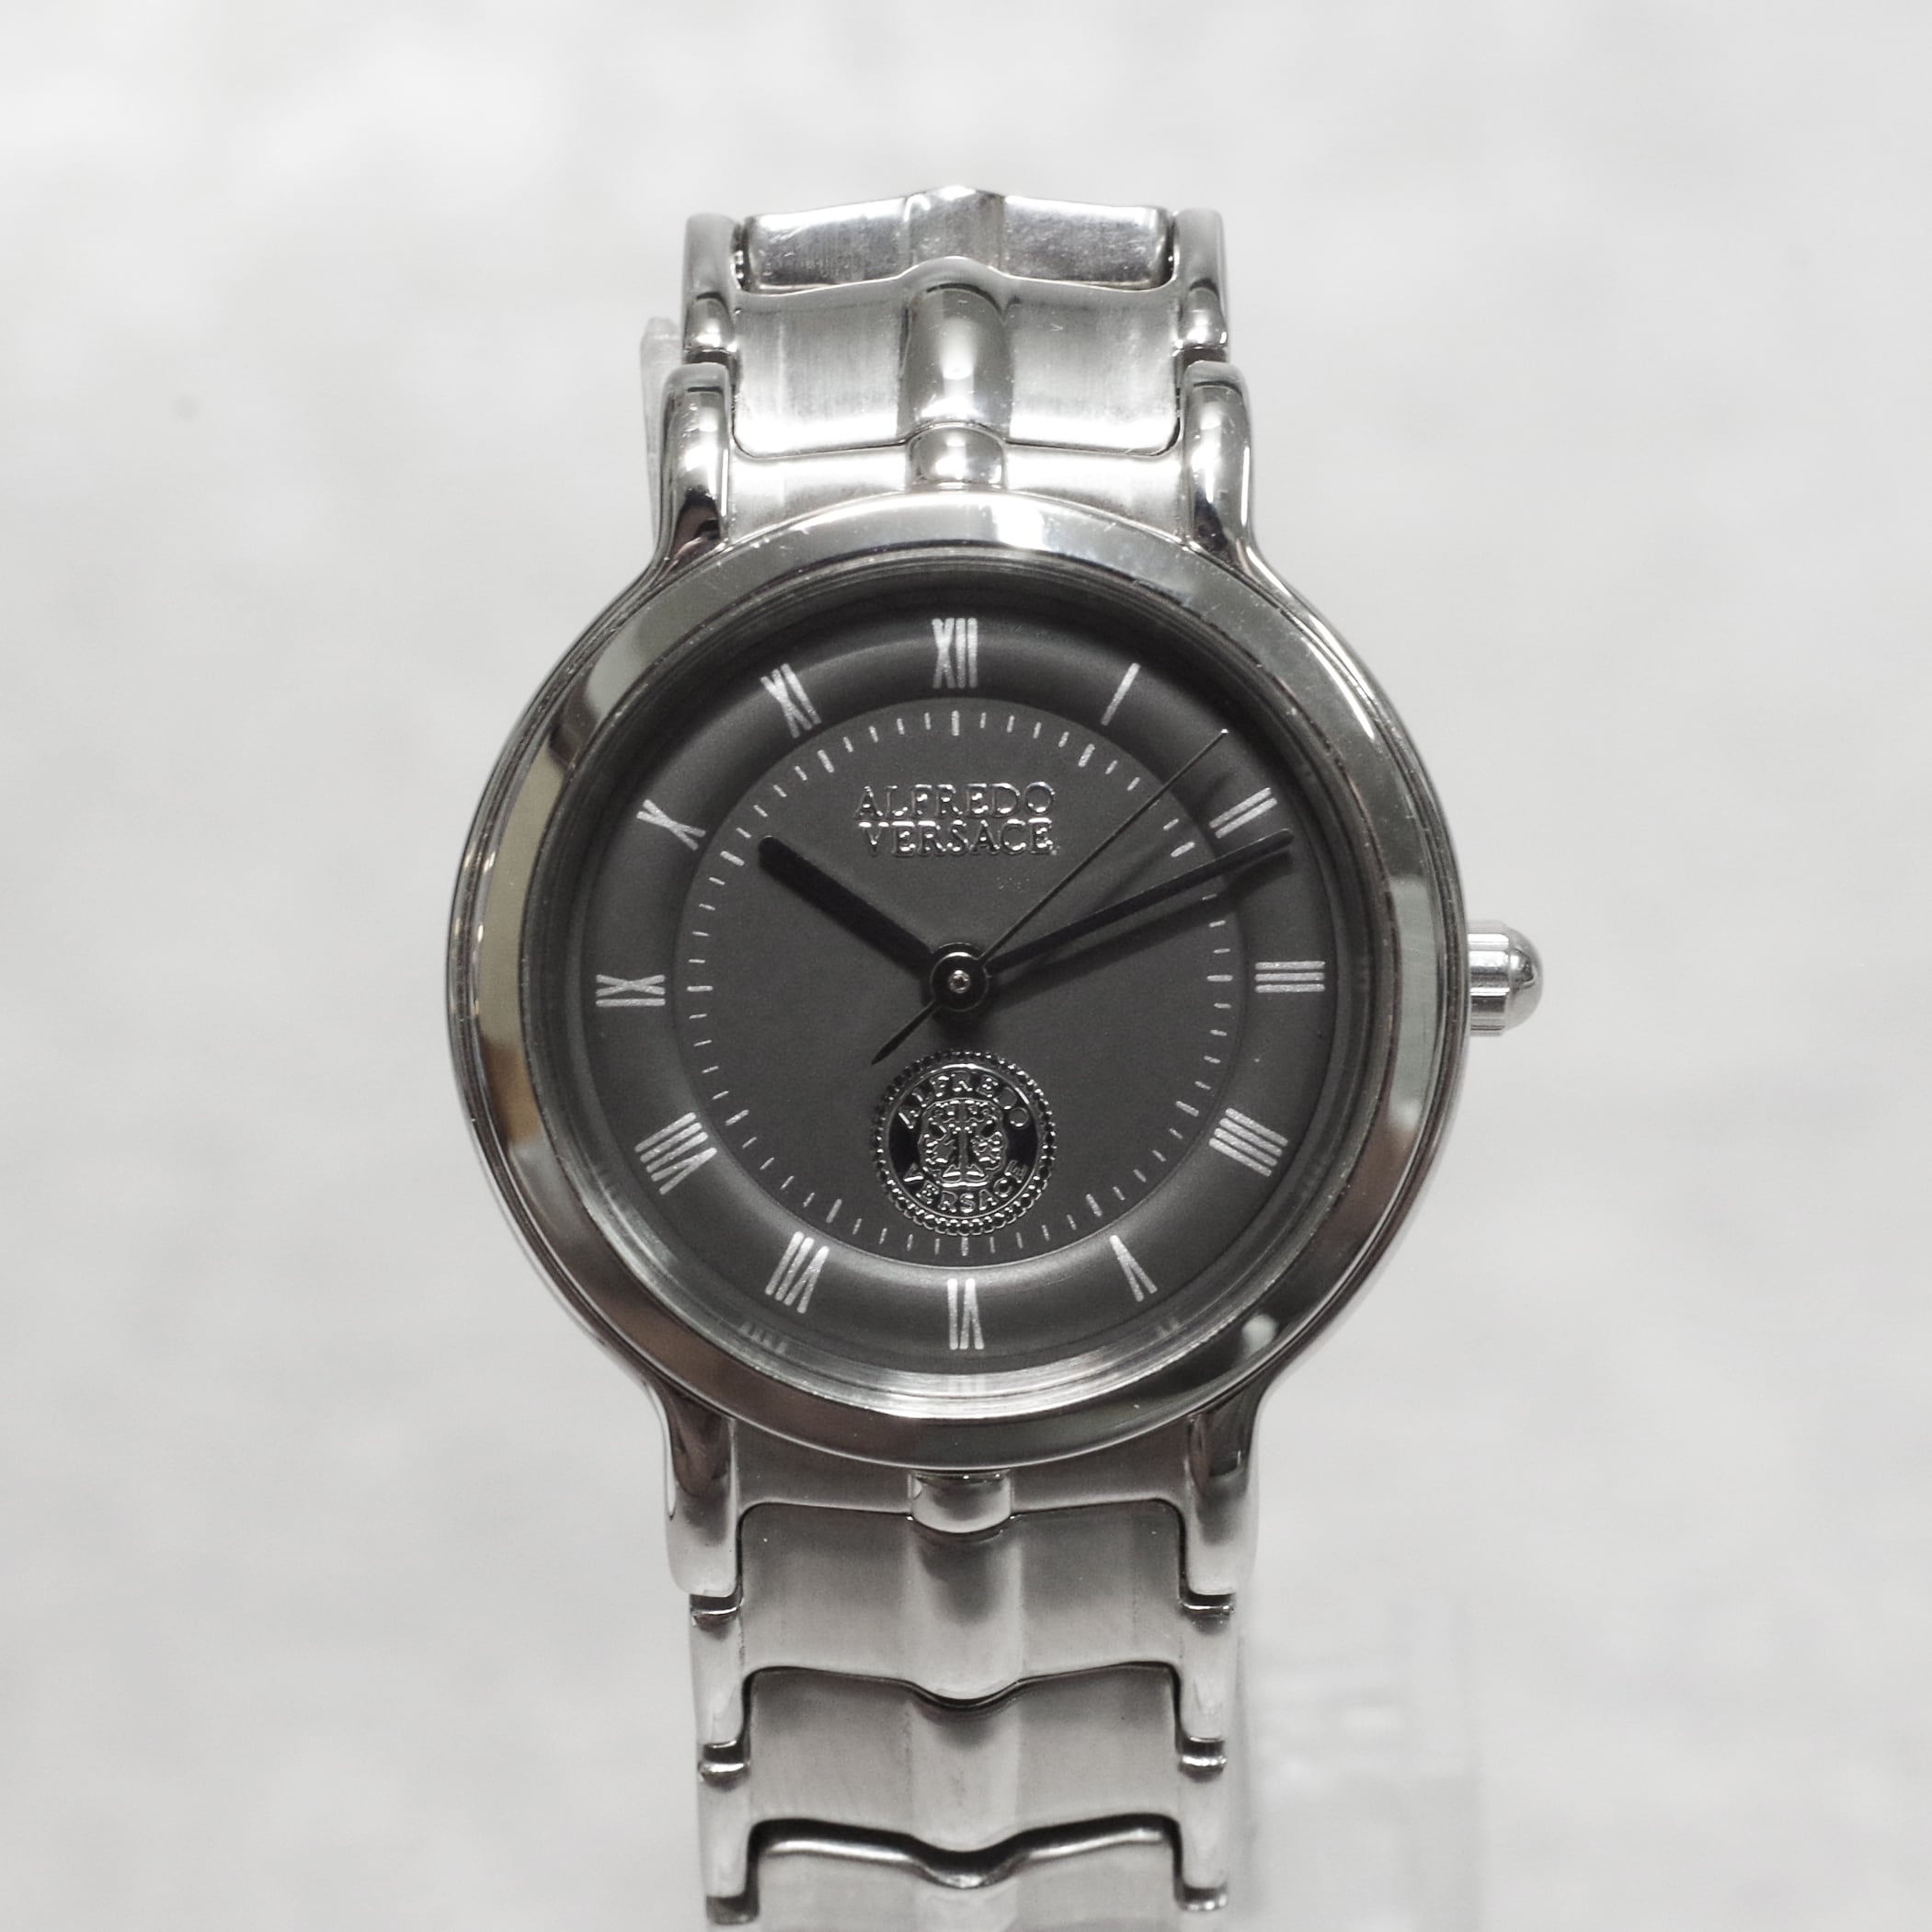 ALFREDO VERSACE ヴェルサーチ V822S SS クォーツ グレー文字盤 腕時計 レディース